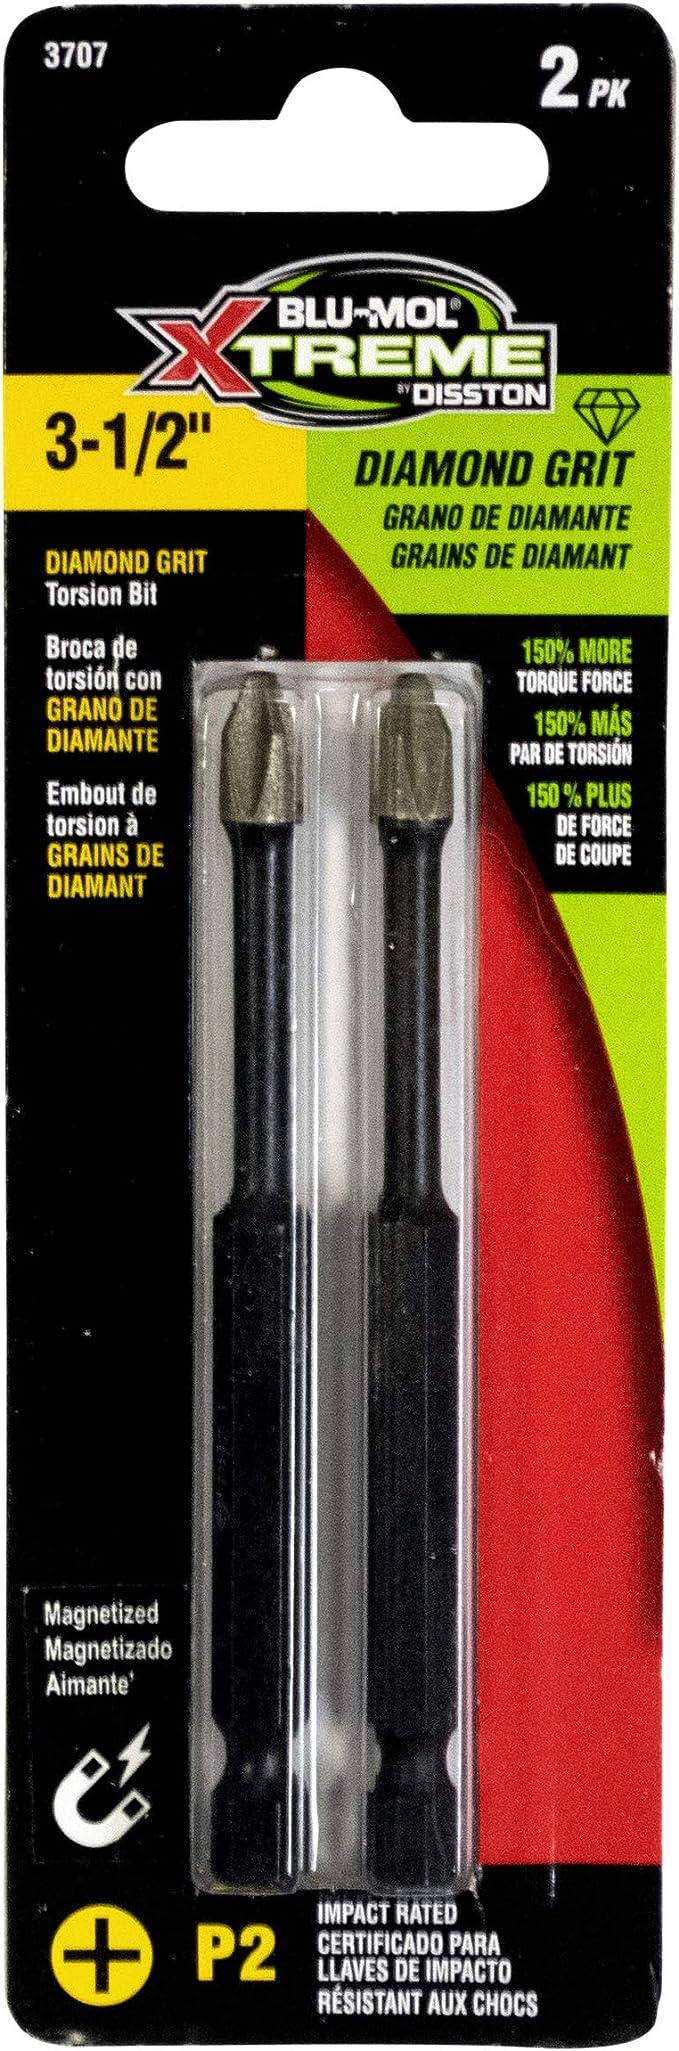 2-Pack E0103730 1 inch Disston Diamond Grit Screwdriving Bit 30 Torx